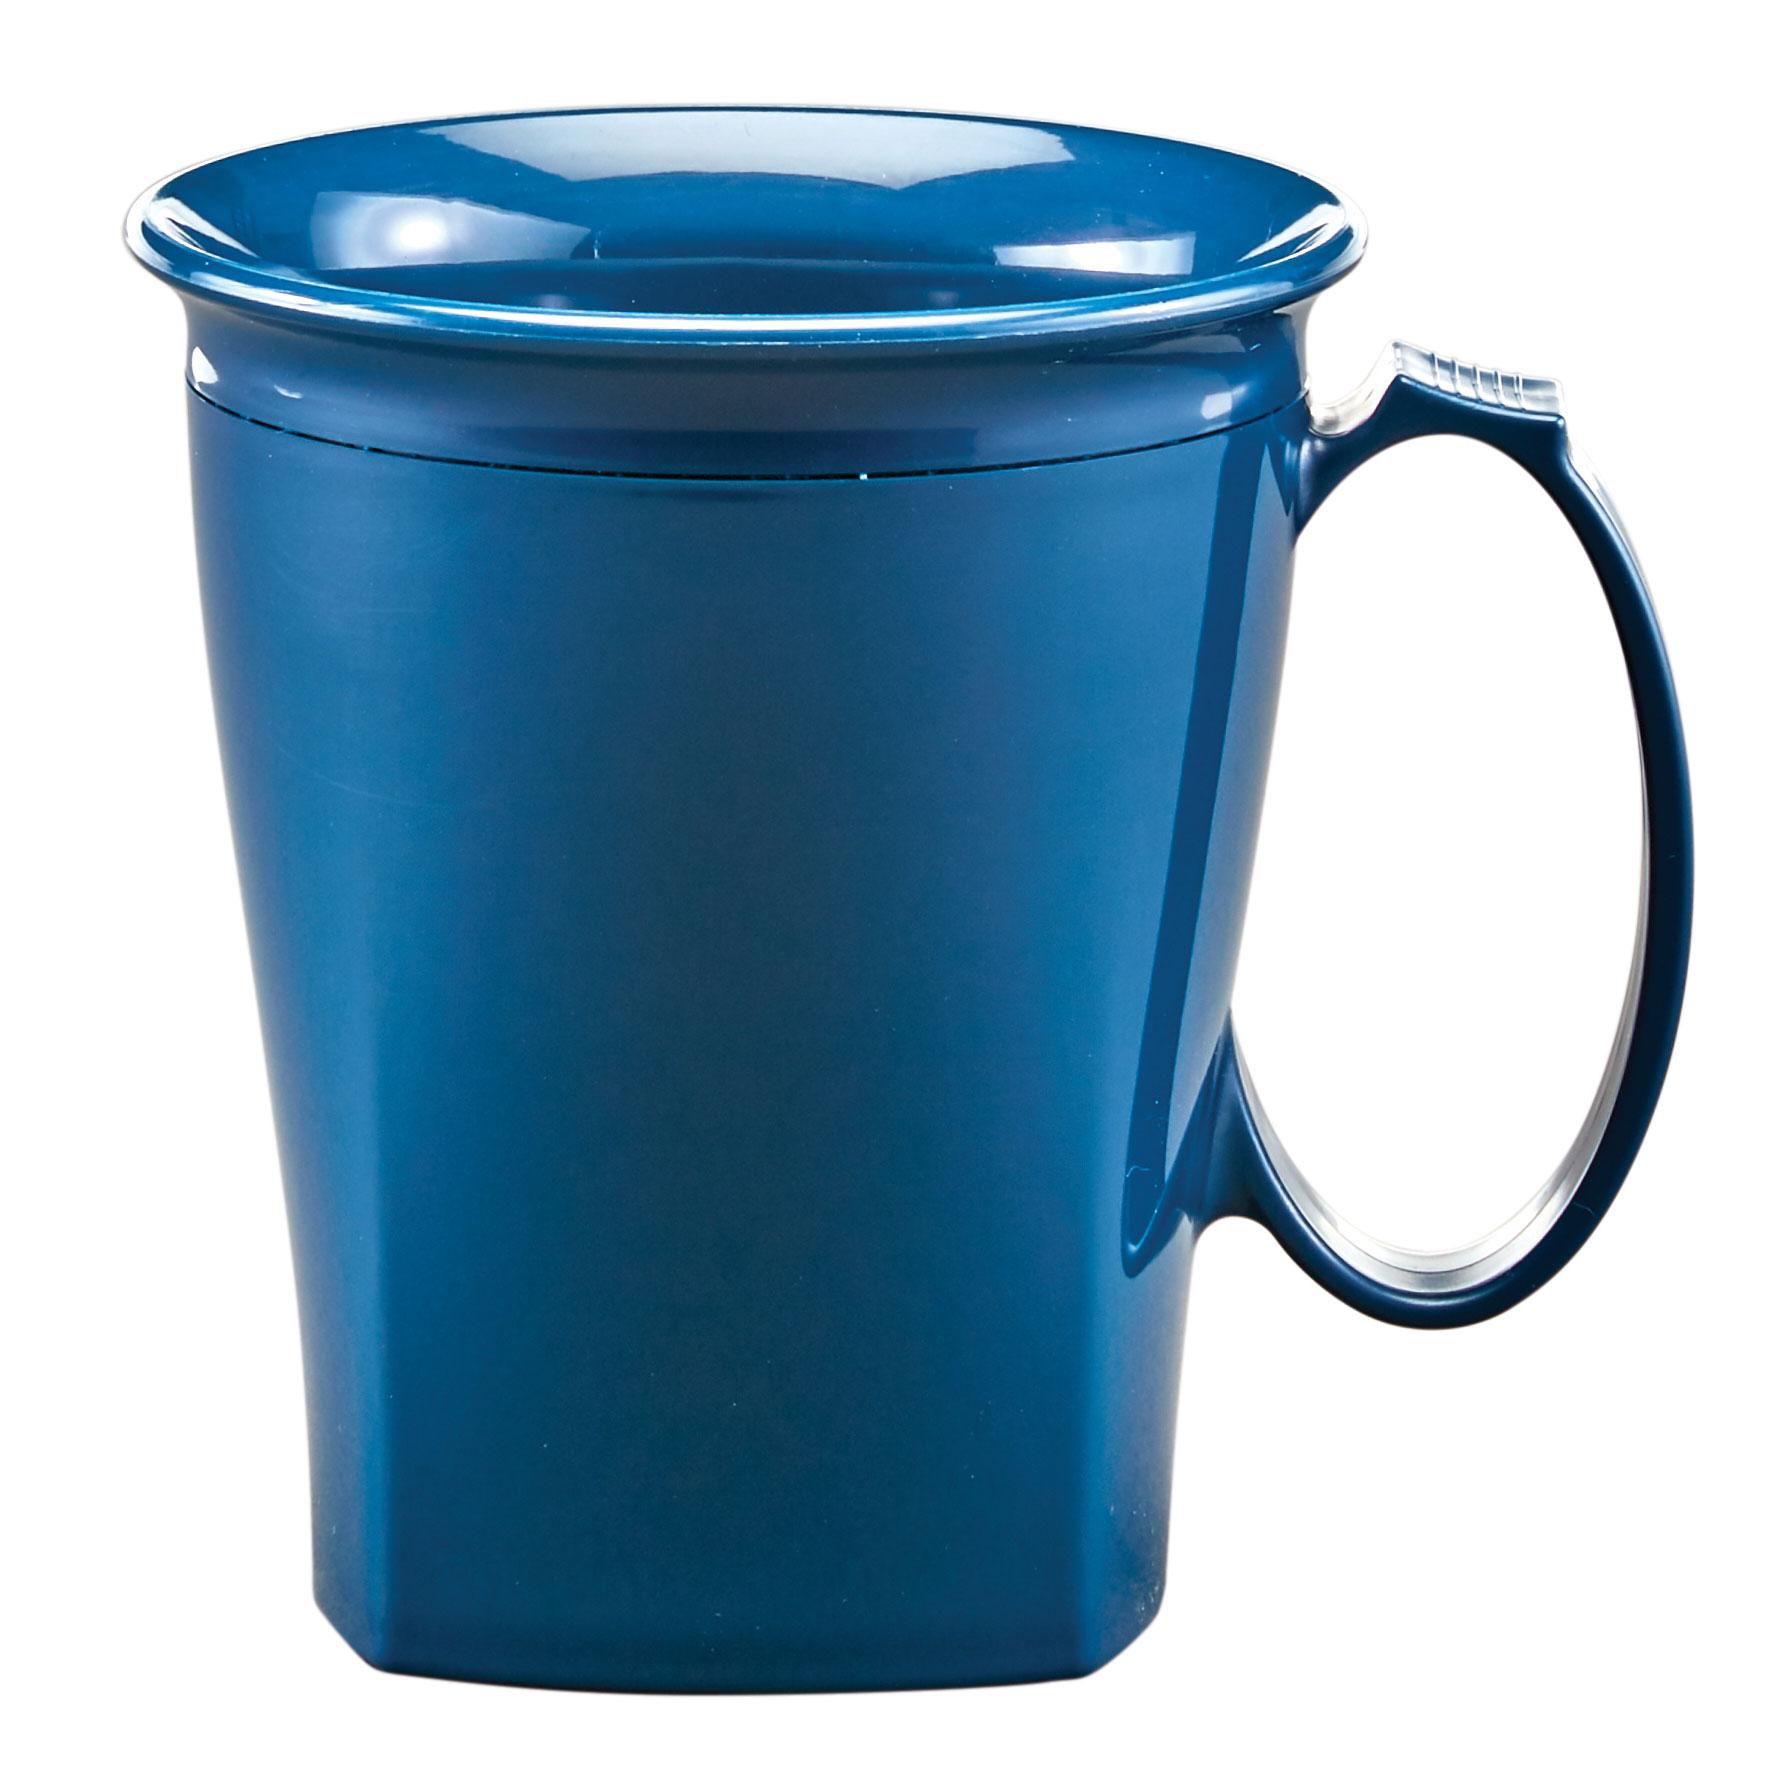 Cambro MDSHM8497 mugs/cups (non disposable)